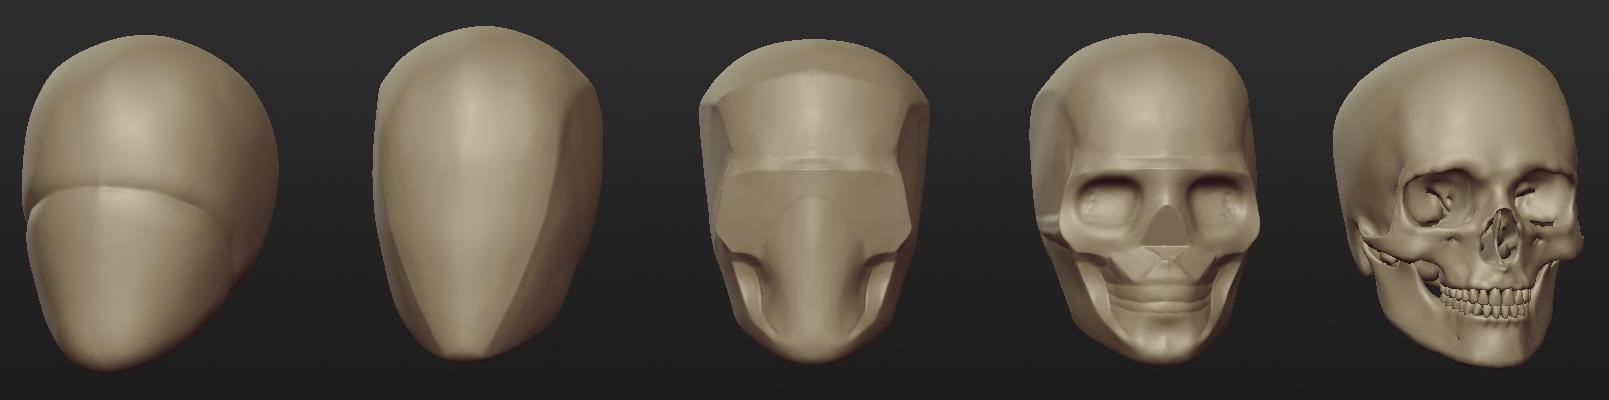 skull transition front.png